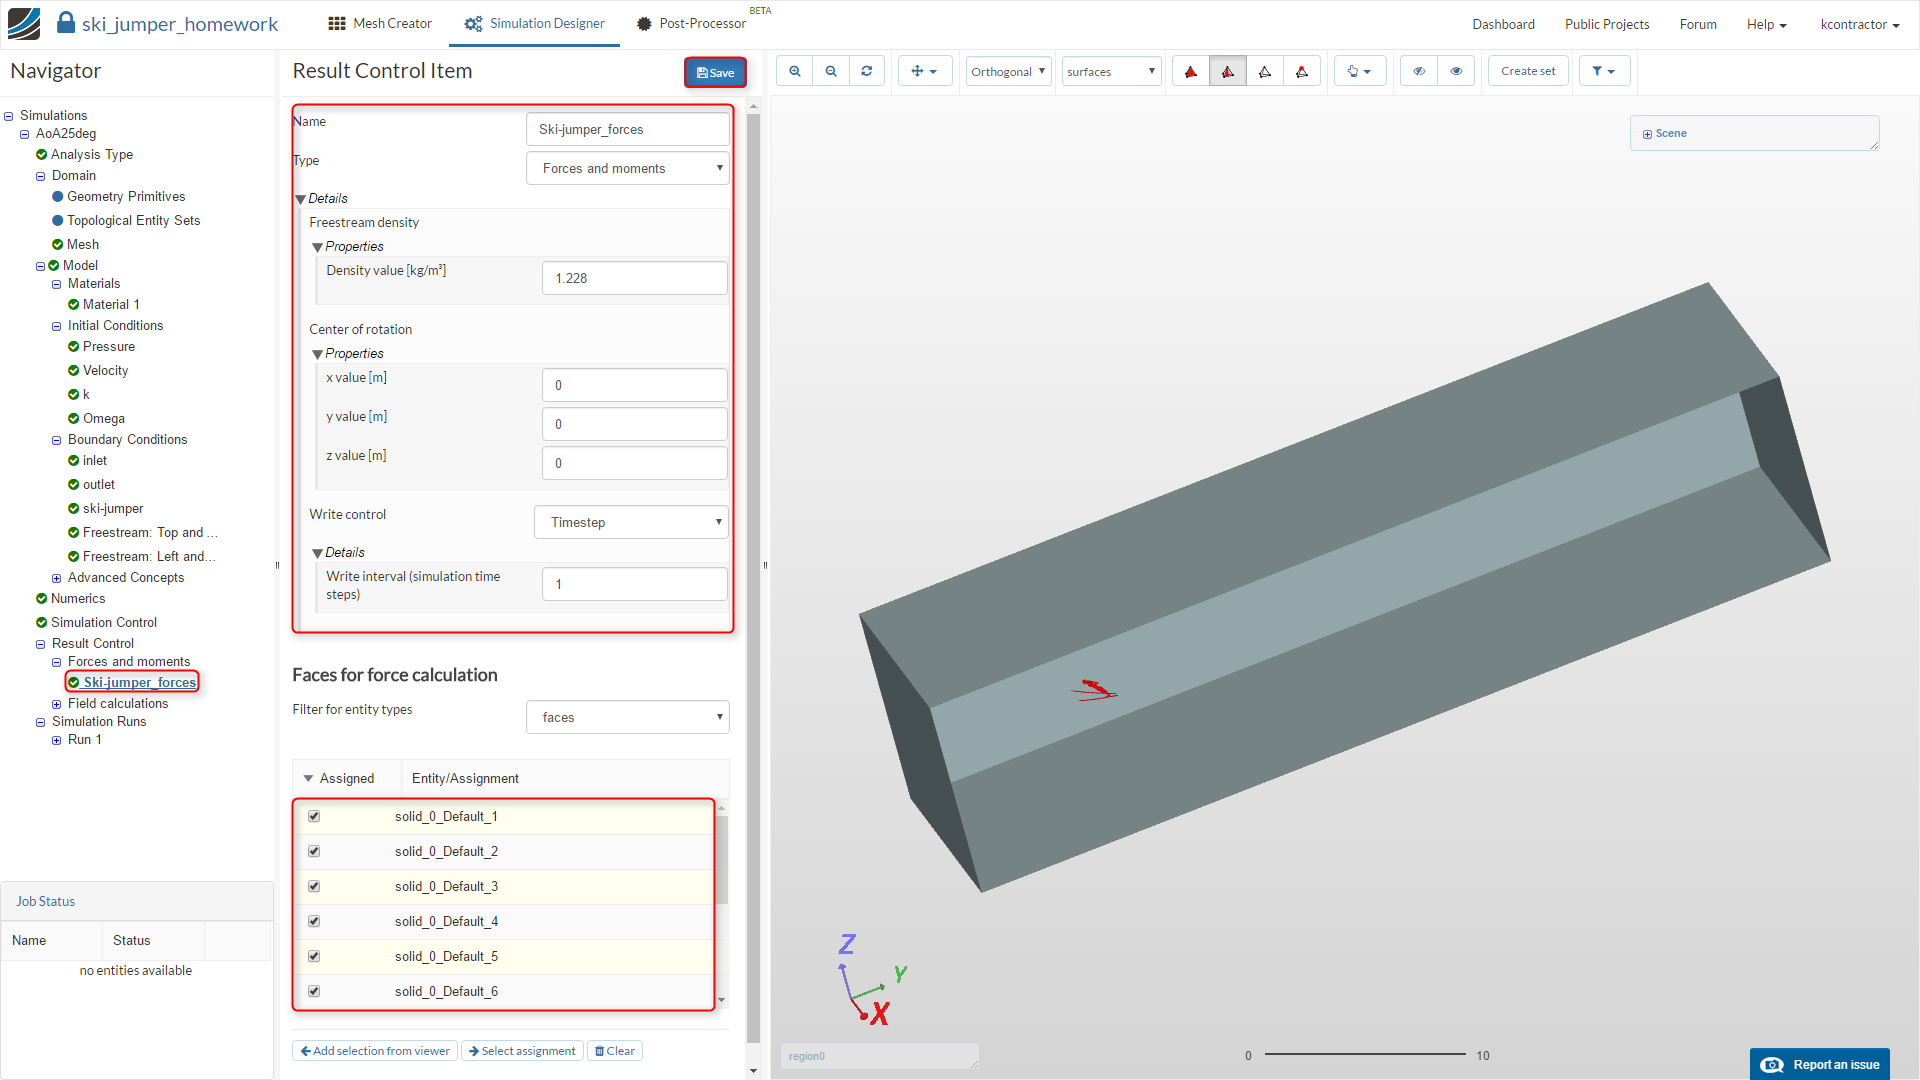 sports aerodynamics Workshop homework step-by-step tutorial, additional result control item setup